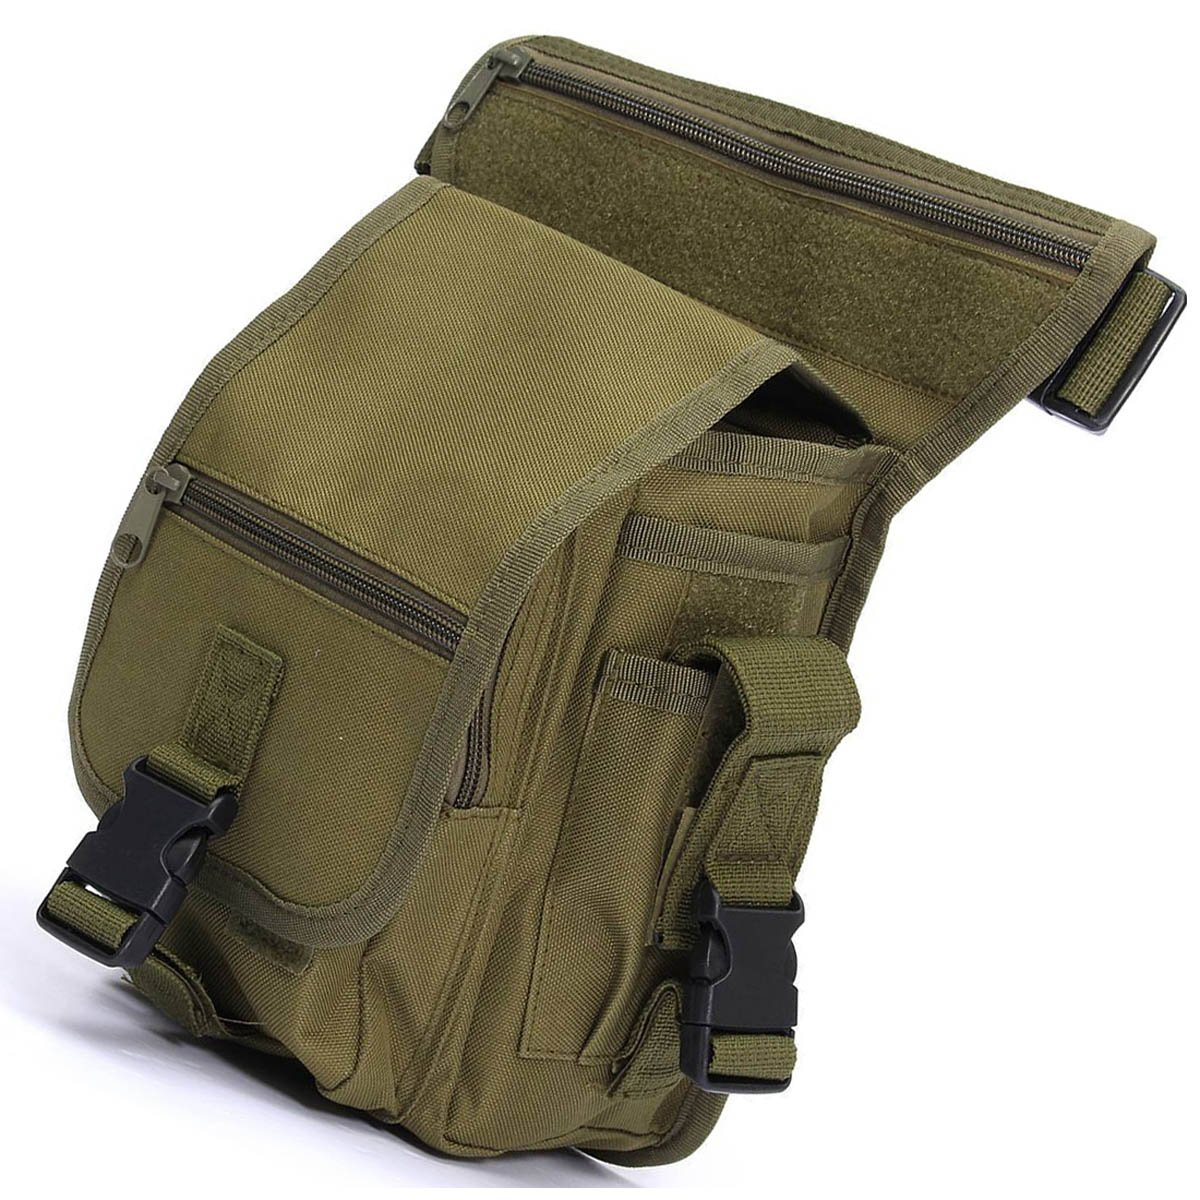 Anjoy Drop Leg Bag Fanny Waist Thigh Packs Outdoor Military Tactical Pouches ebest